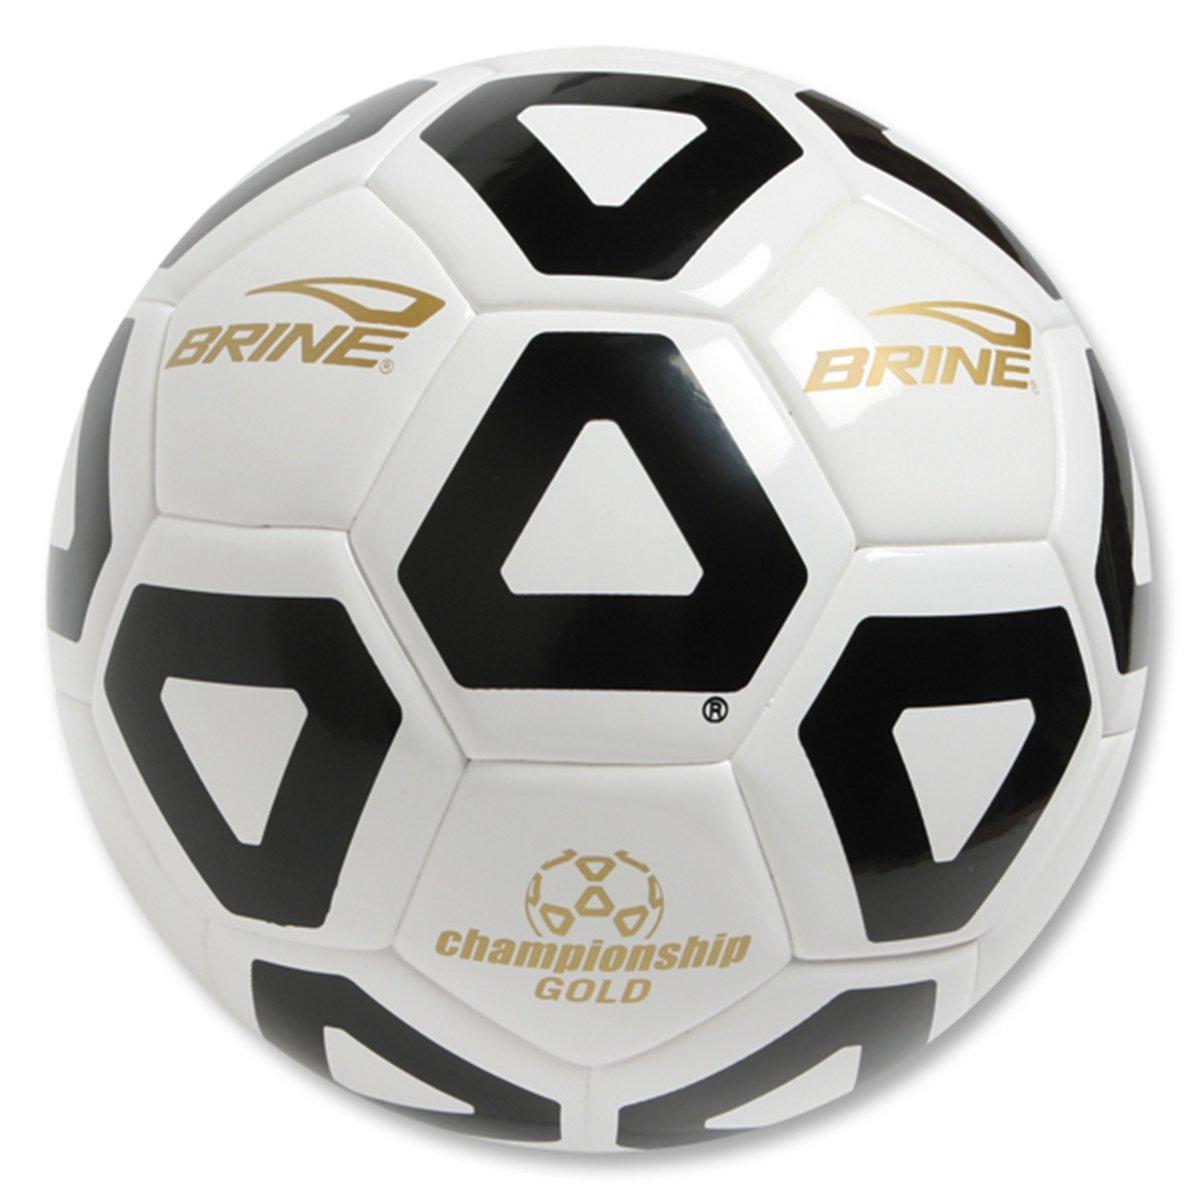 Brine Championshipハイブリッドゴールドサッカーボール B002YQGHAA5